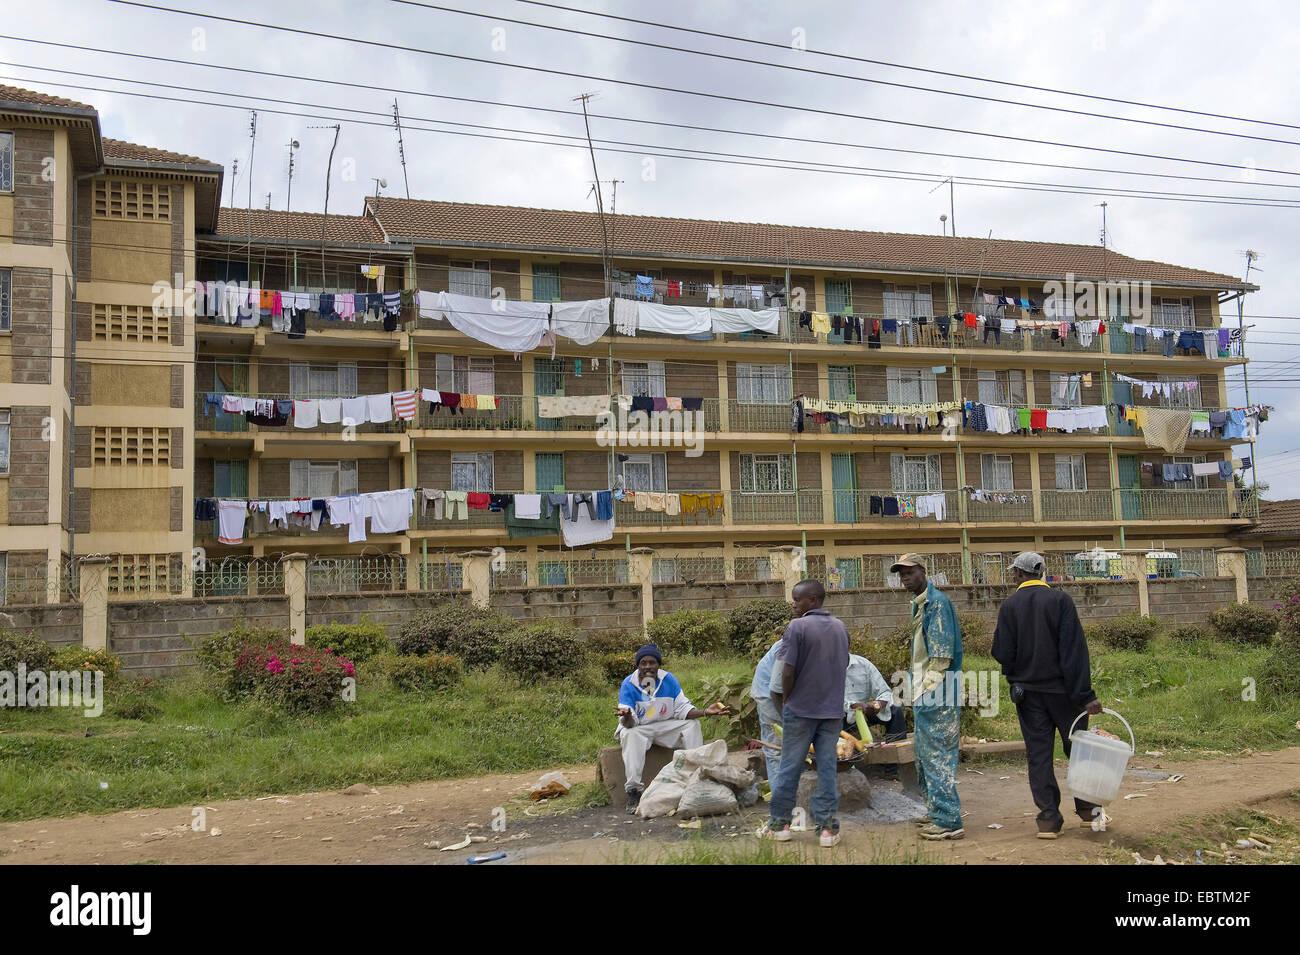 group of dark-skinned young men in front of apartment building, Kenya, Nairobi - Stock Image